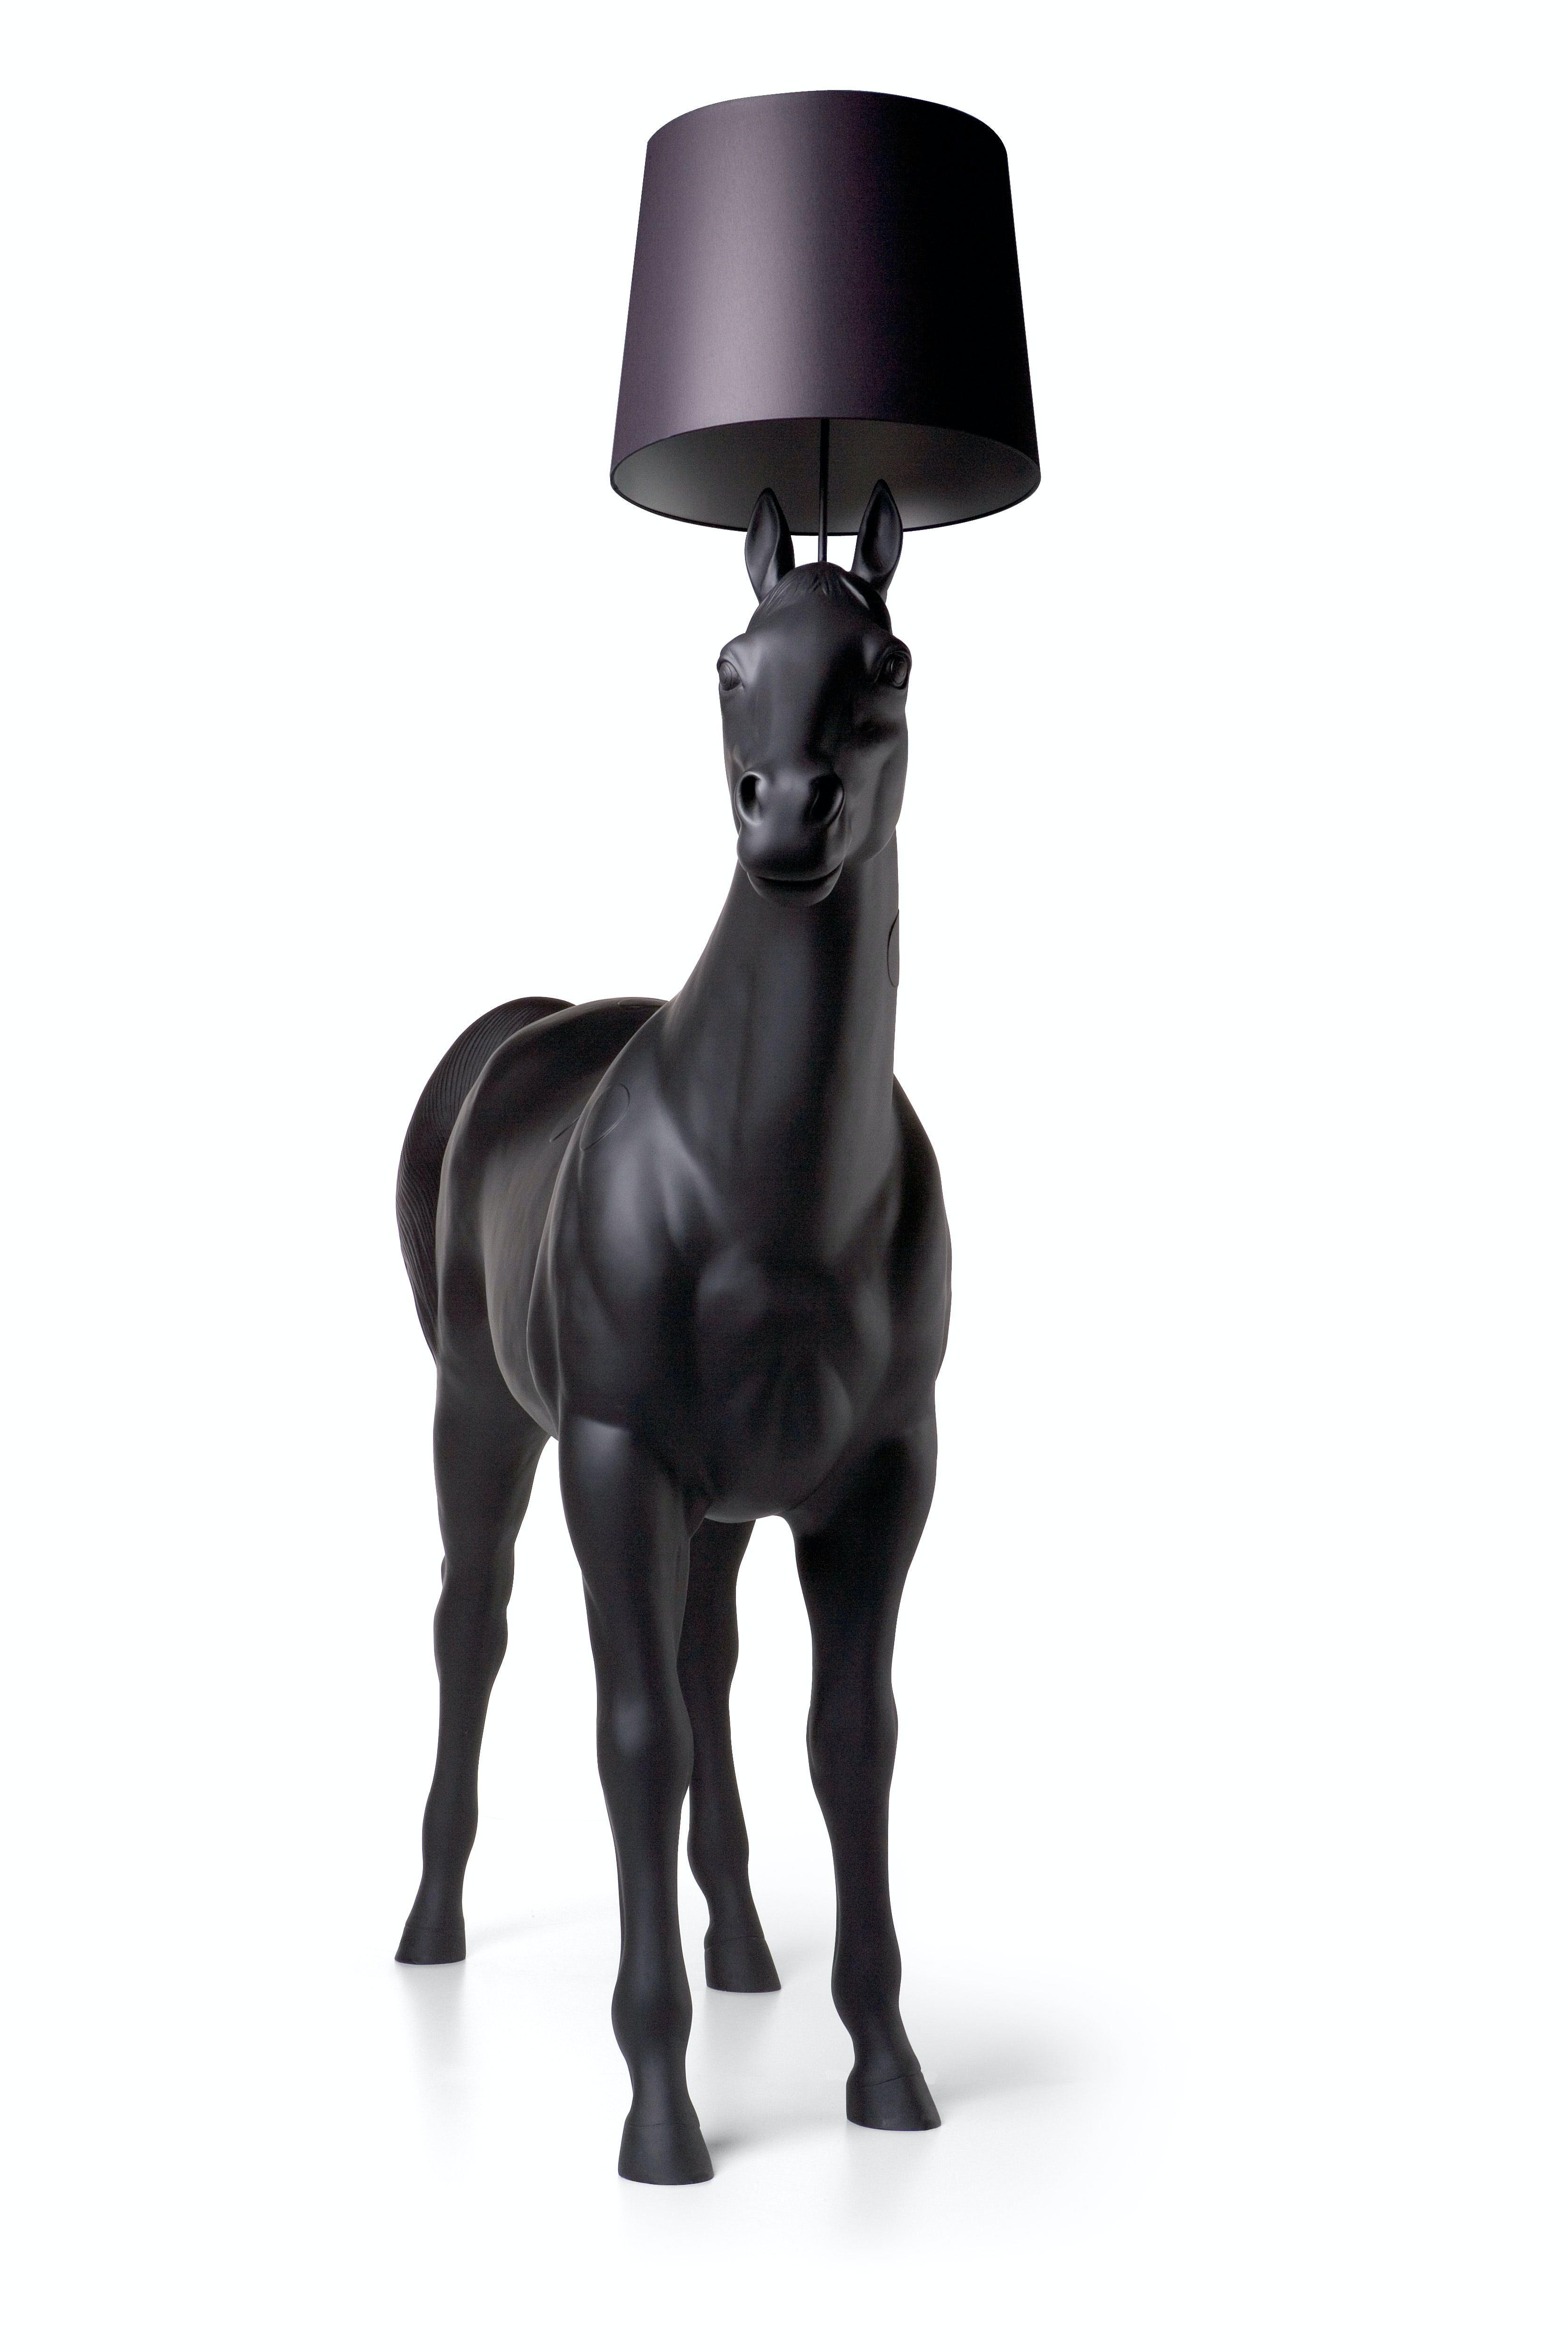 Horselamp2